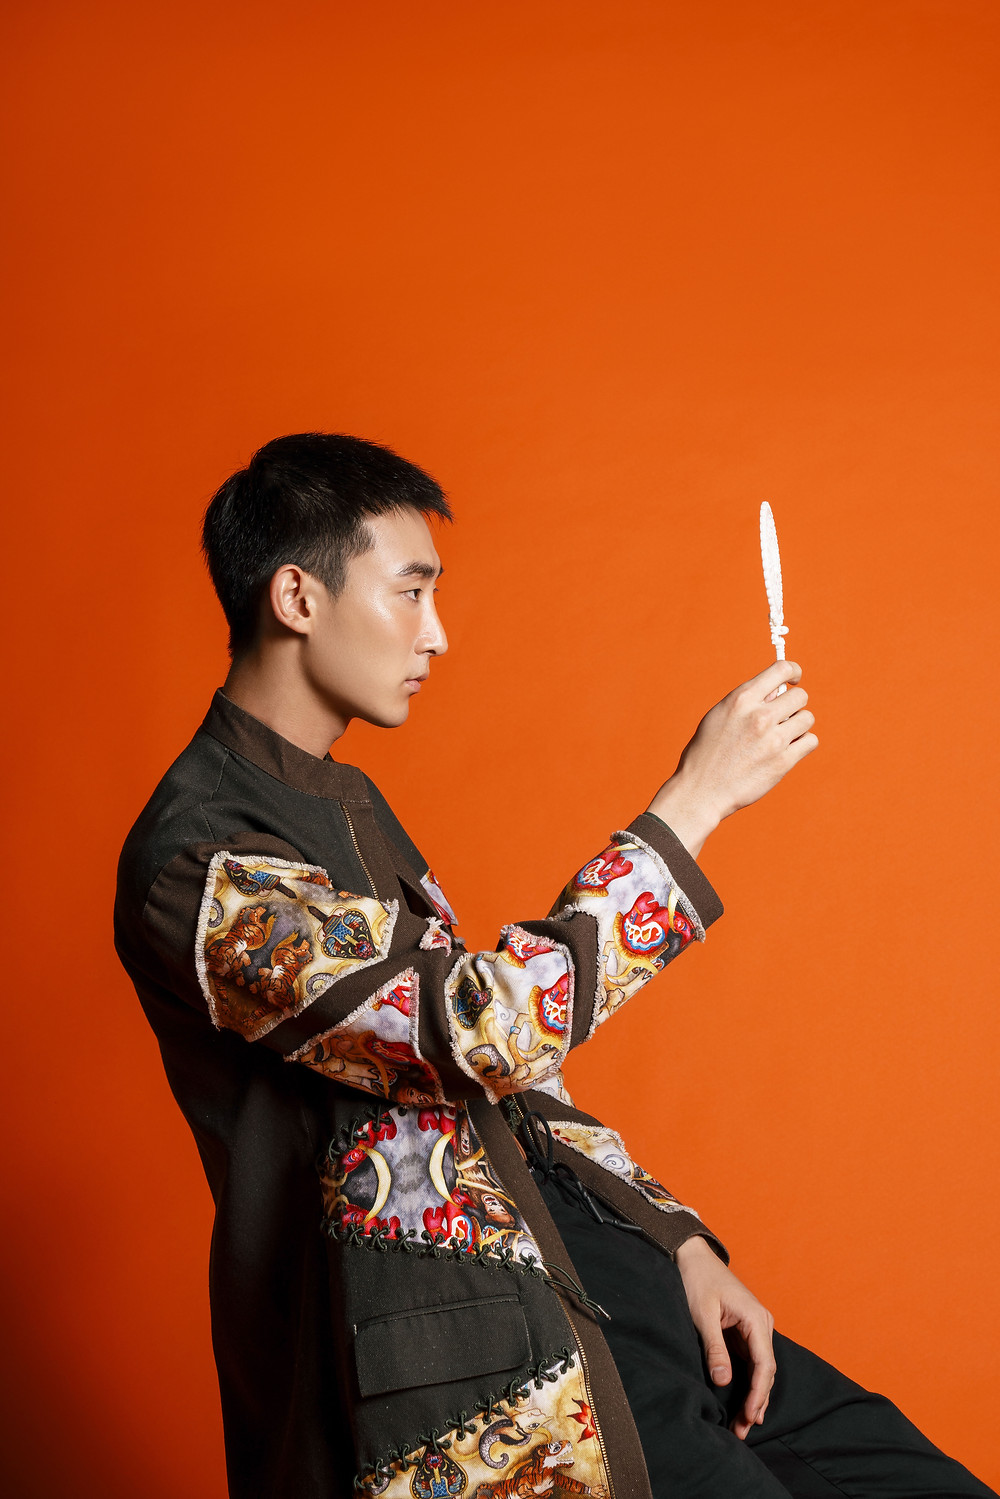 Coat Jacket from @temmaprasetio x @han_chandra GENERASI Collection, Pants @pullandbear